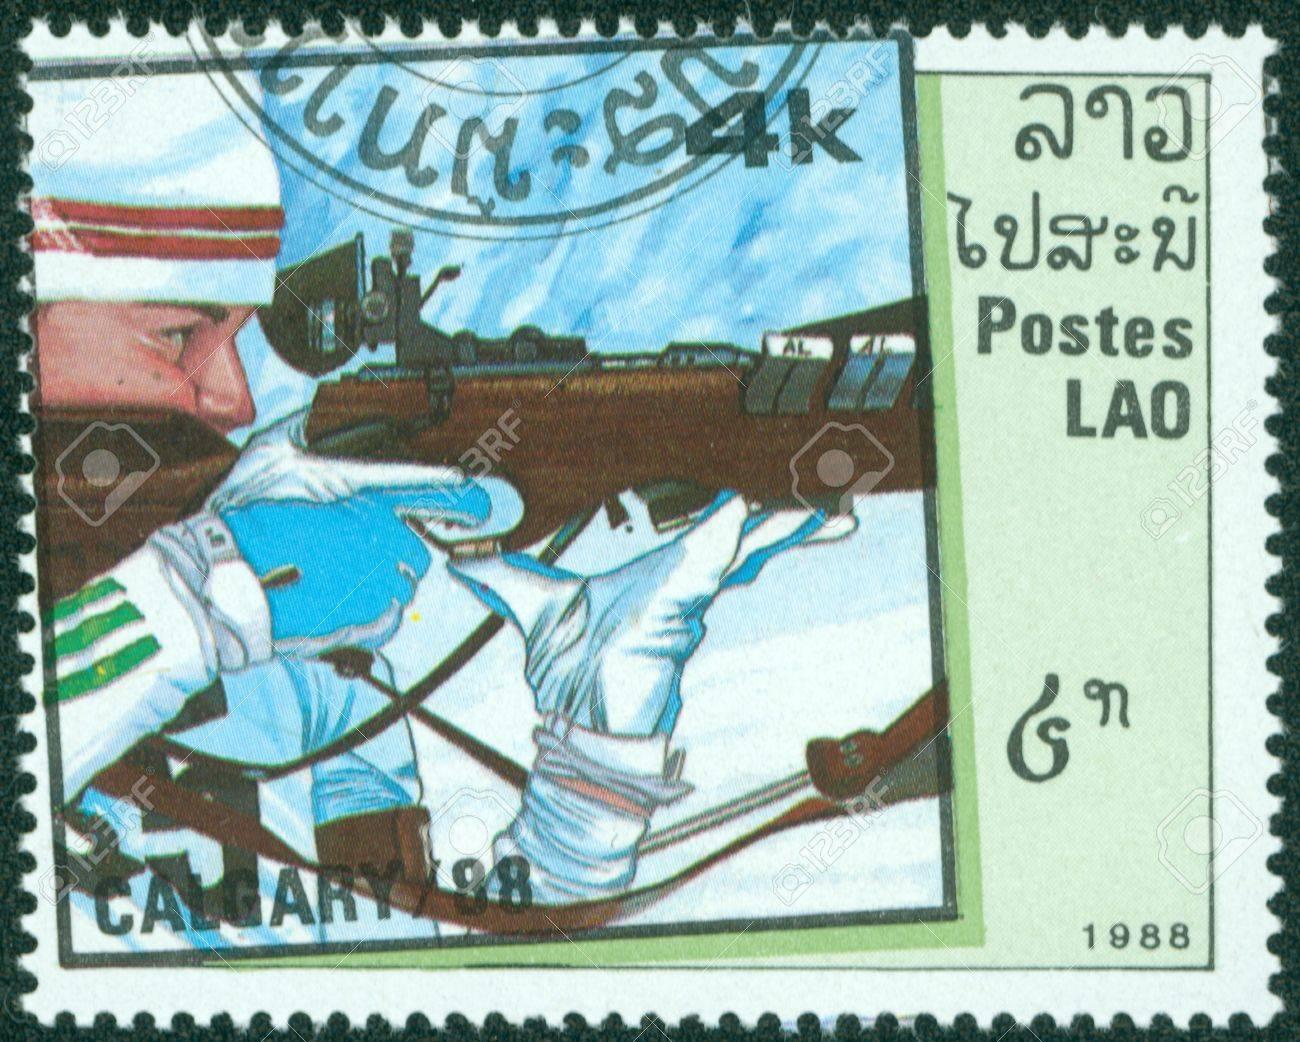 LAOS - CIRCA 1988  stamp printed by Laos, shows biathlon, circa 1988  Stock Photo - 16372594